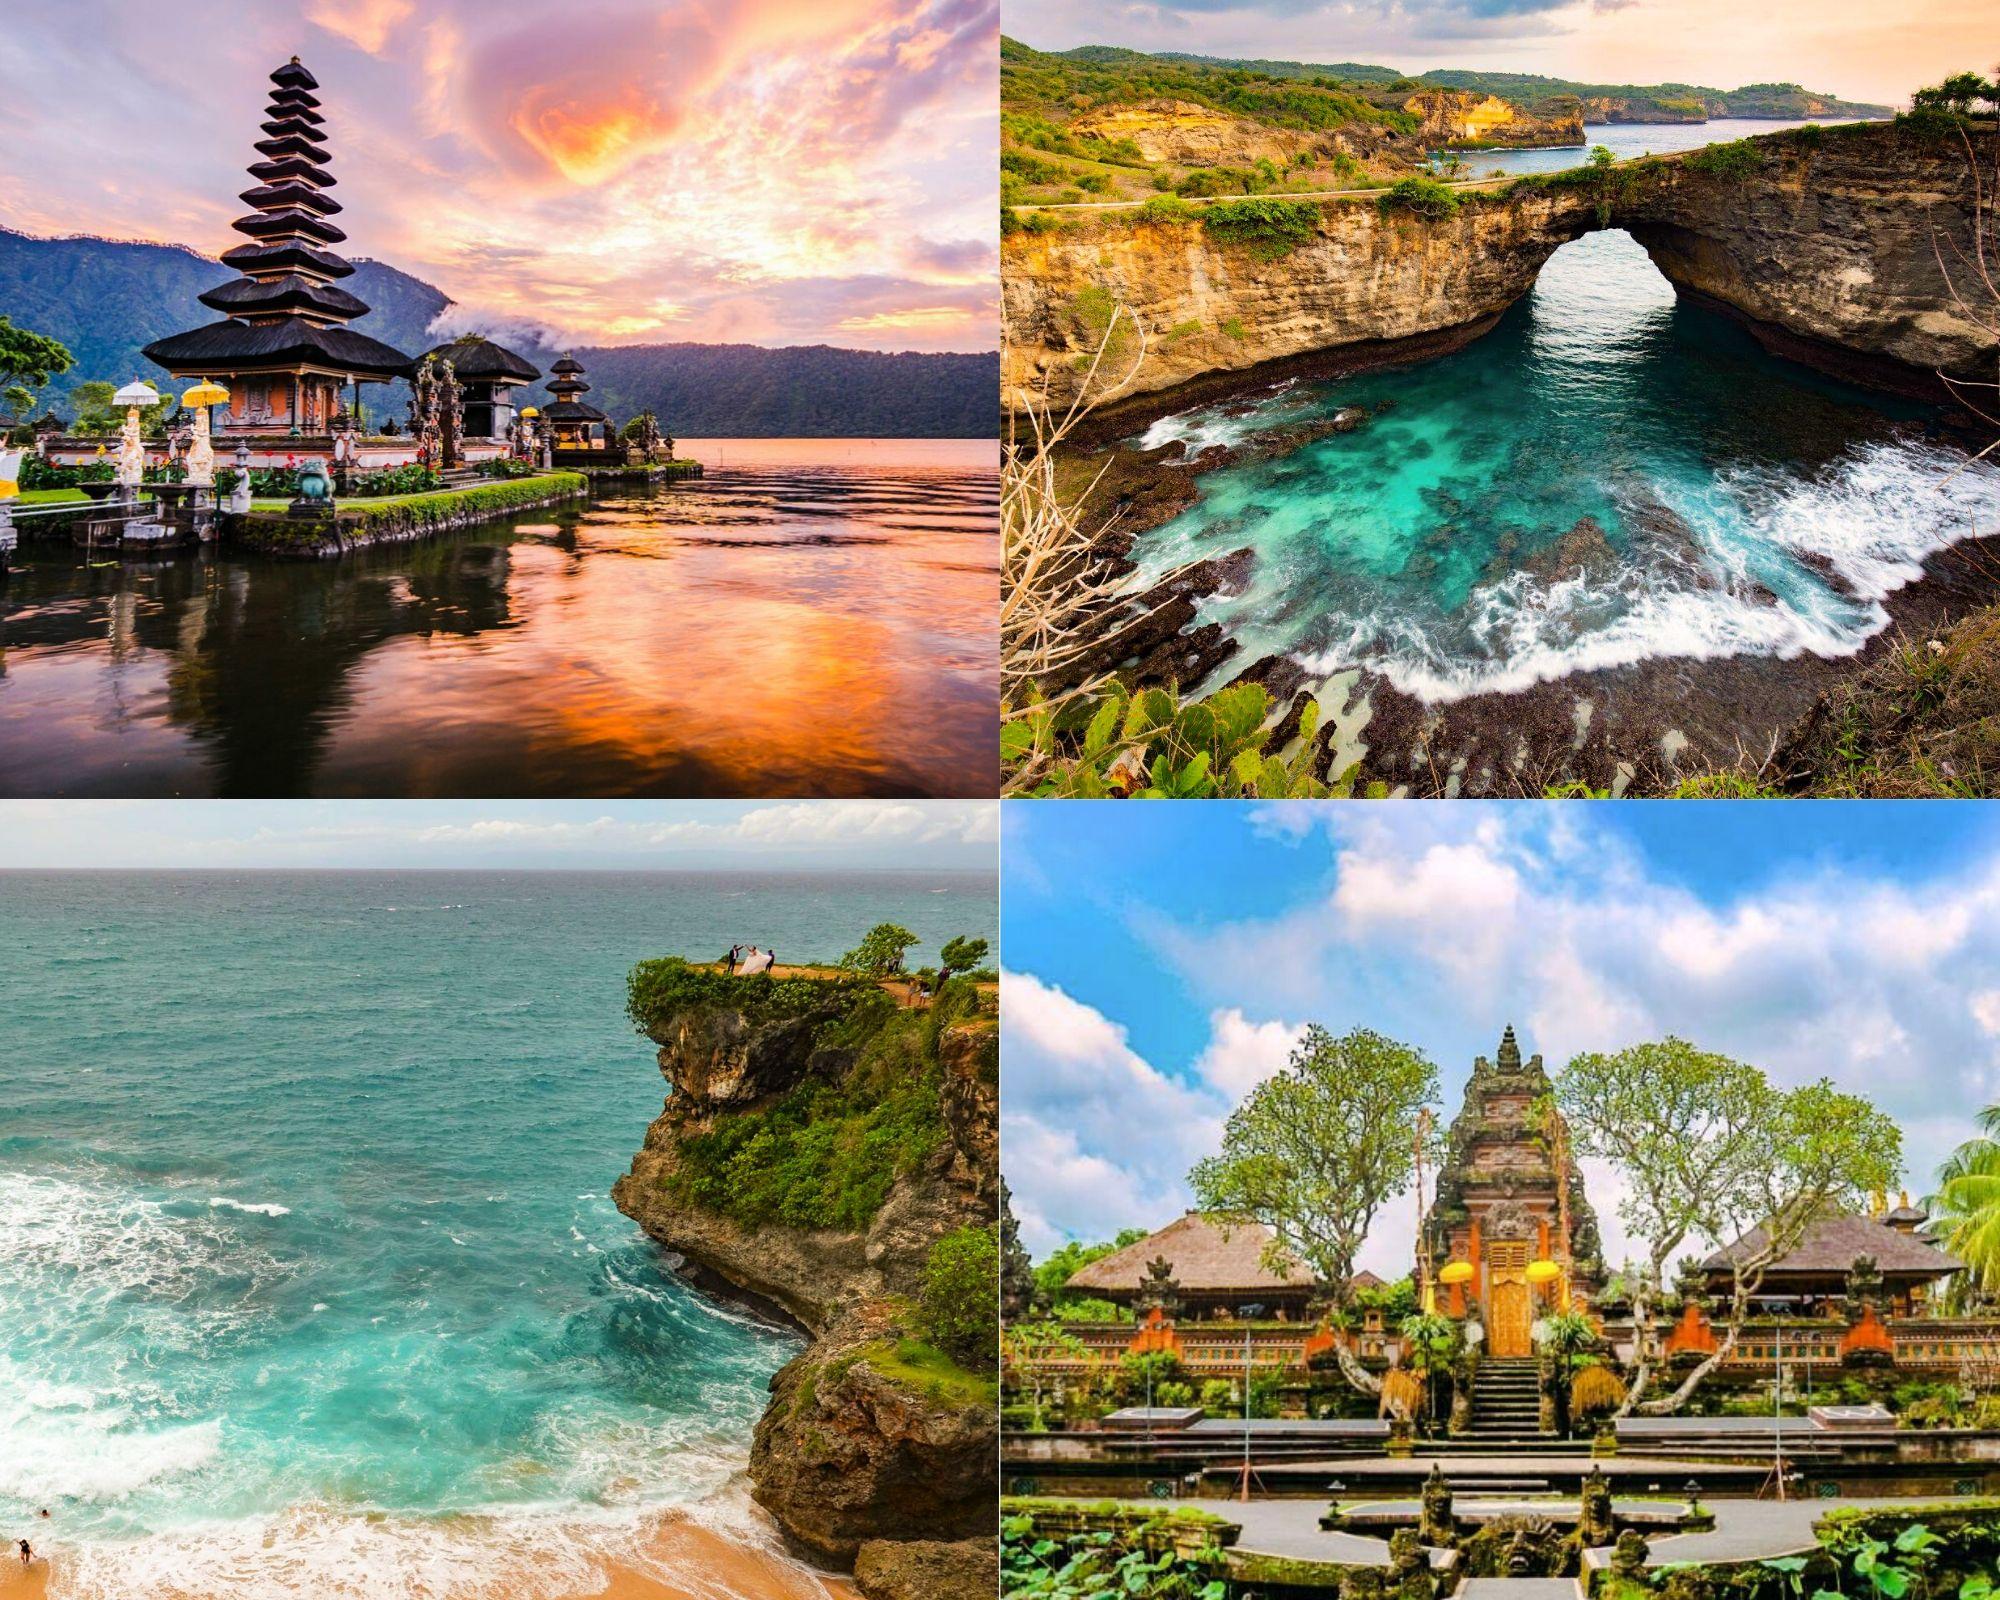 Pengertian pariwisata menurut para ahli - Hello Pariwisata